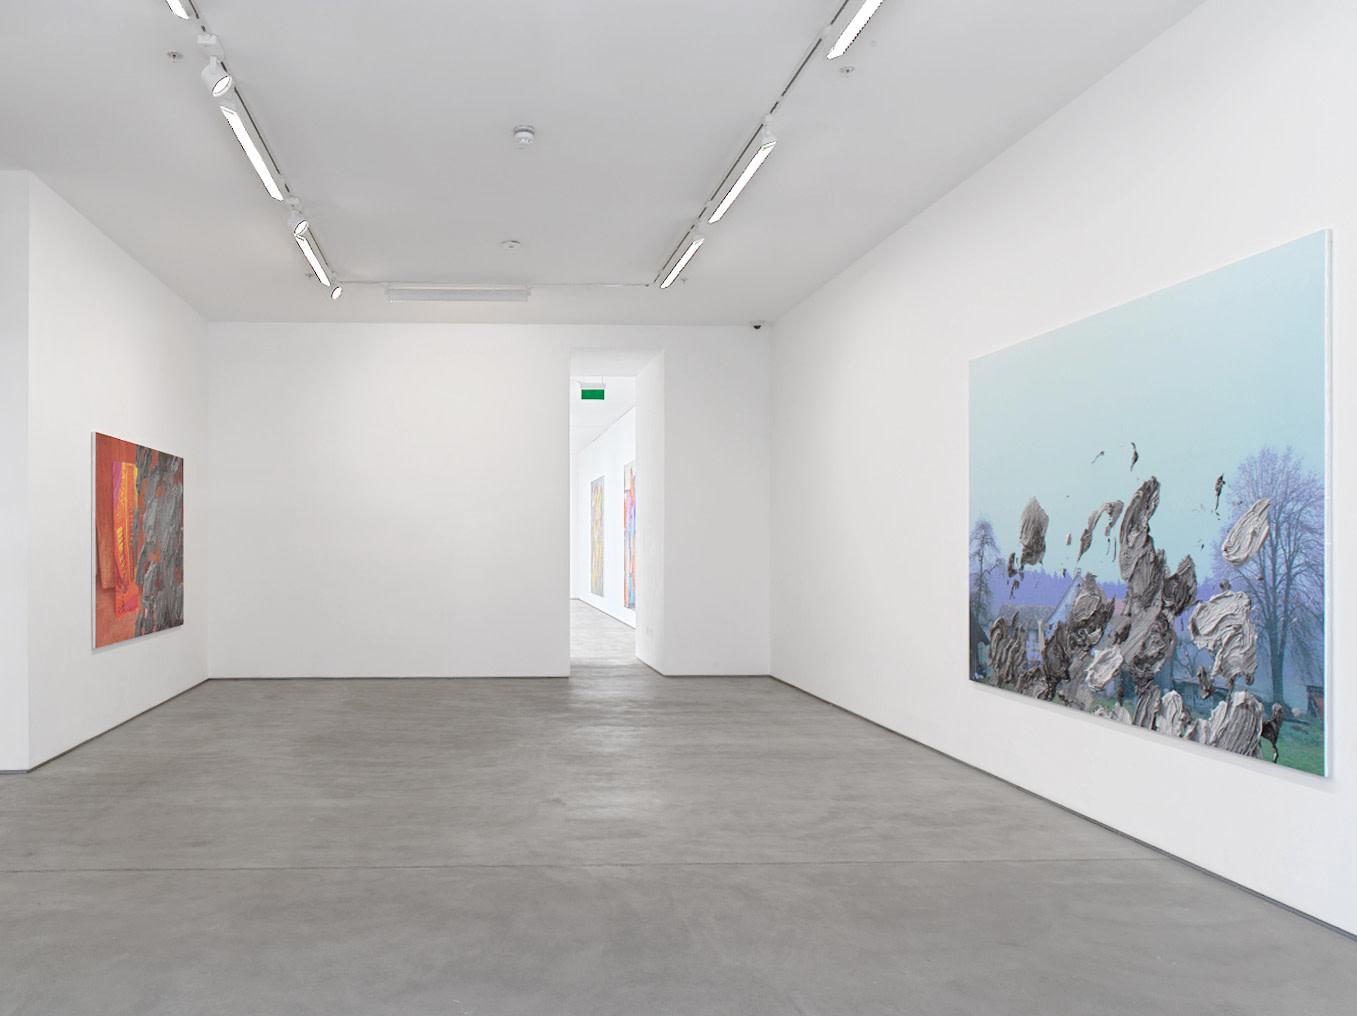 "<div class=""artwork_caption""><p>Installation view,<em>The Intelligence of Nature</em>,Sadie Coles HQ 62 Kingly Street, W1, on view</p><p>Photography byStefan Altenburger</p></div>"